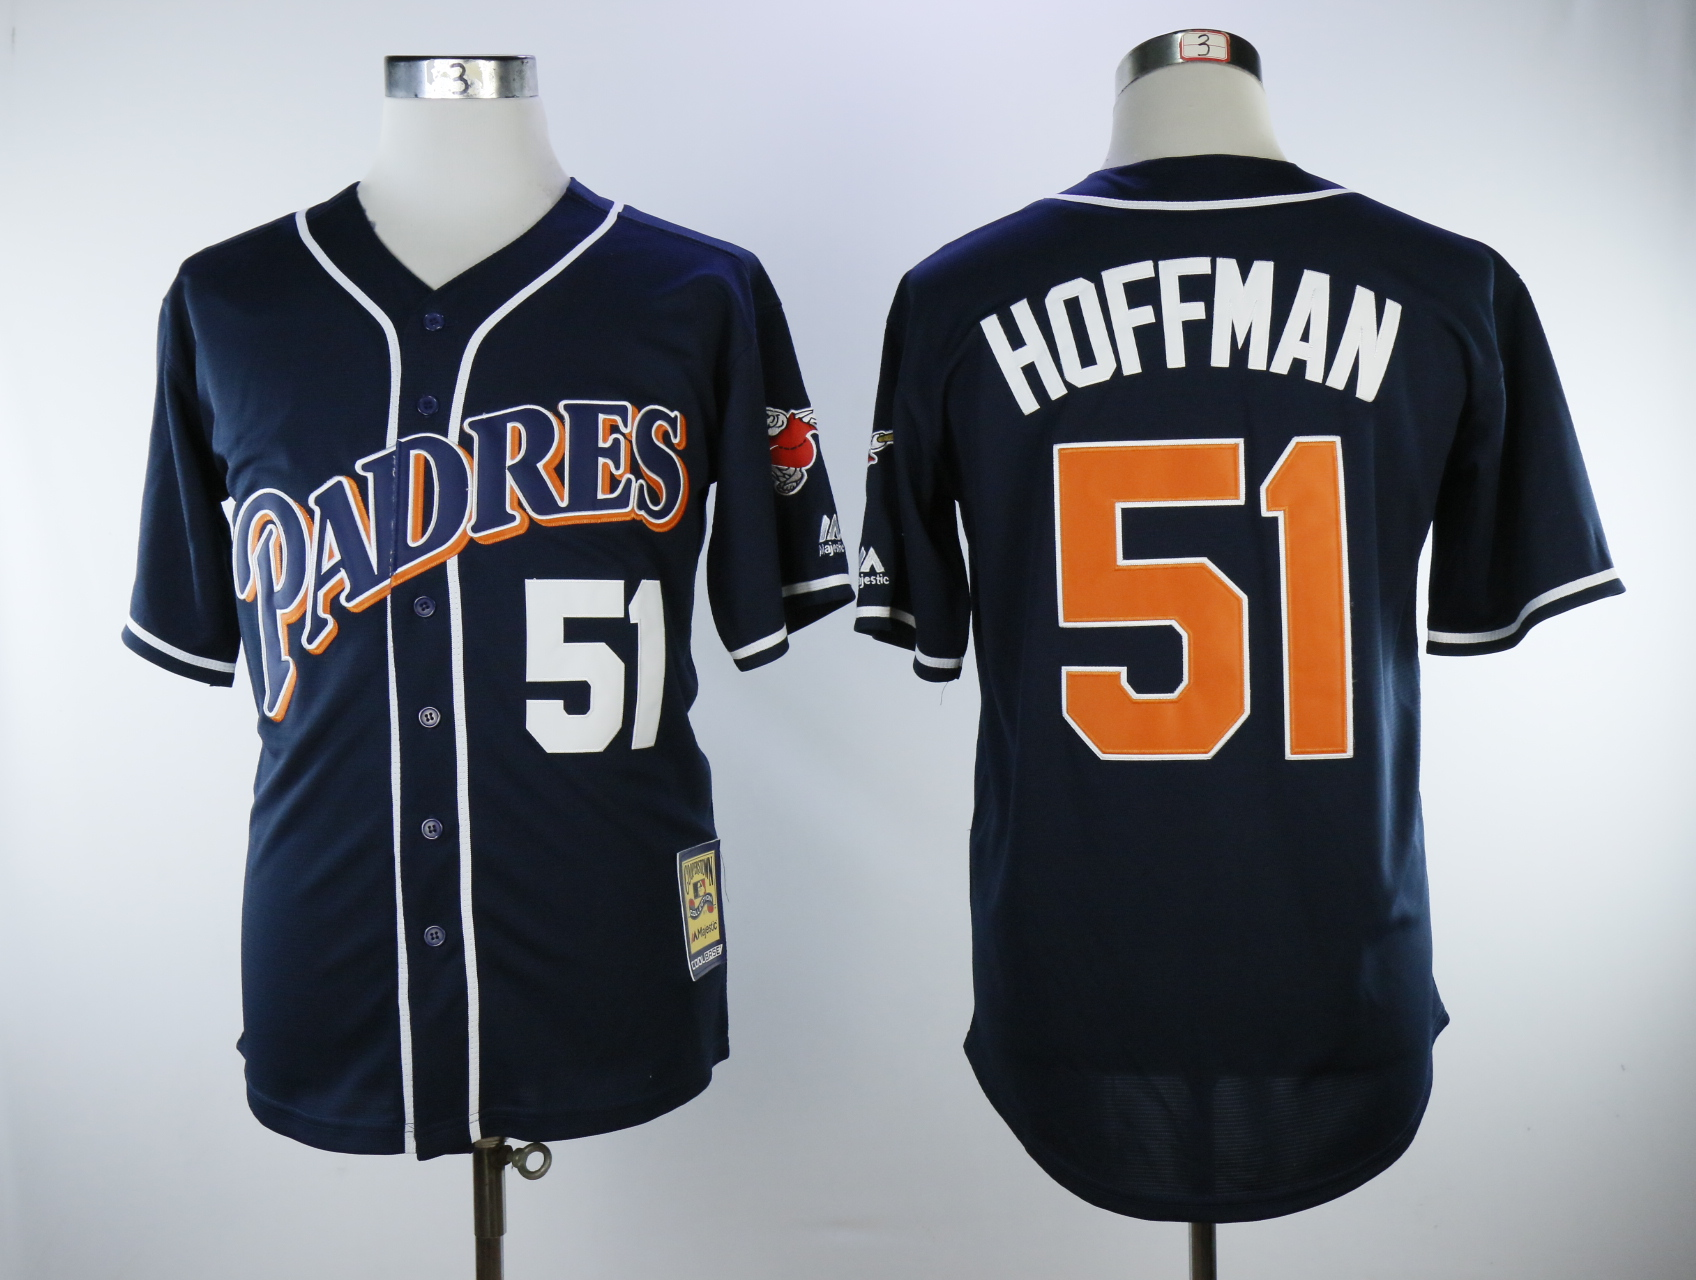 a95c0c1c87b Men s San Diego Padres  5 Trevor Hoffman Jersey Thowback Navy Baseball  Jerseys